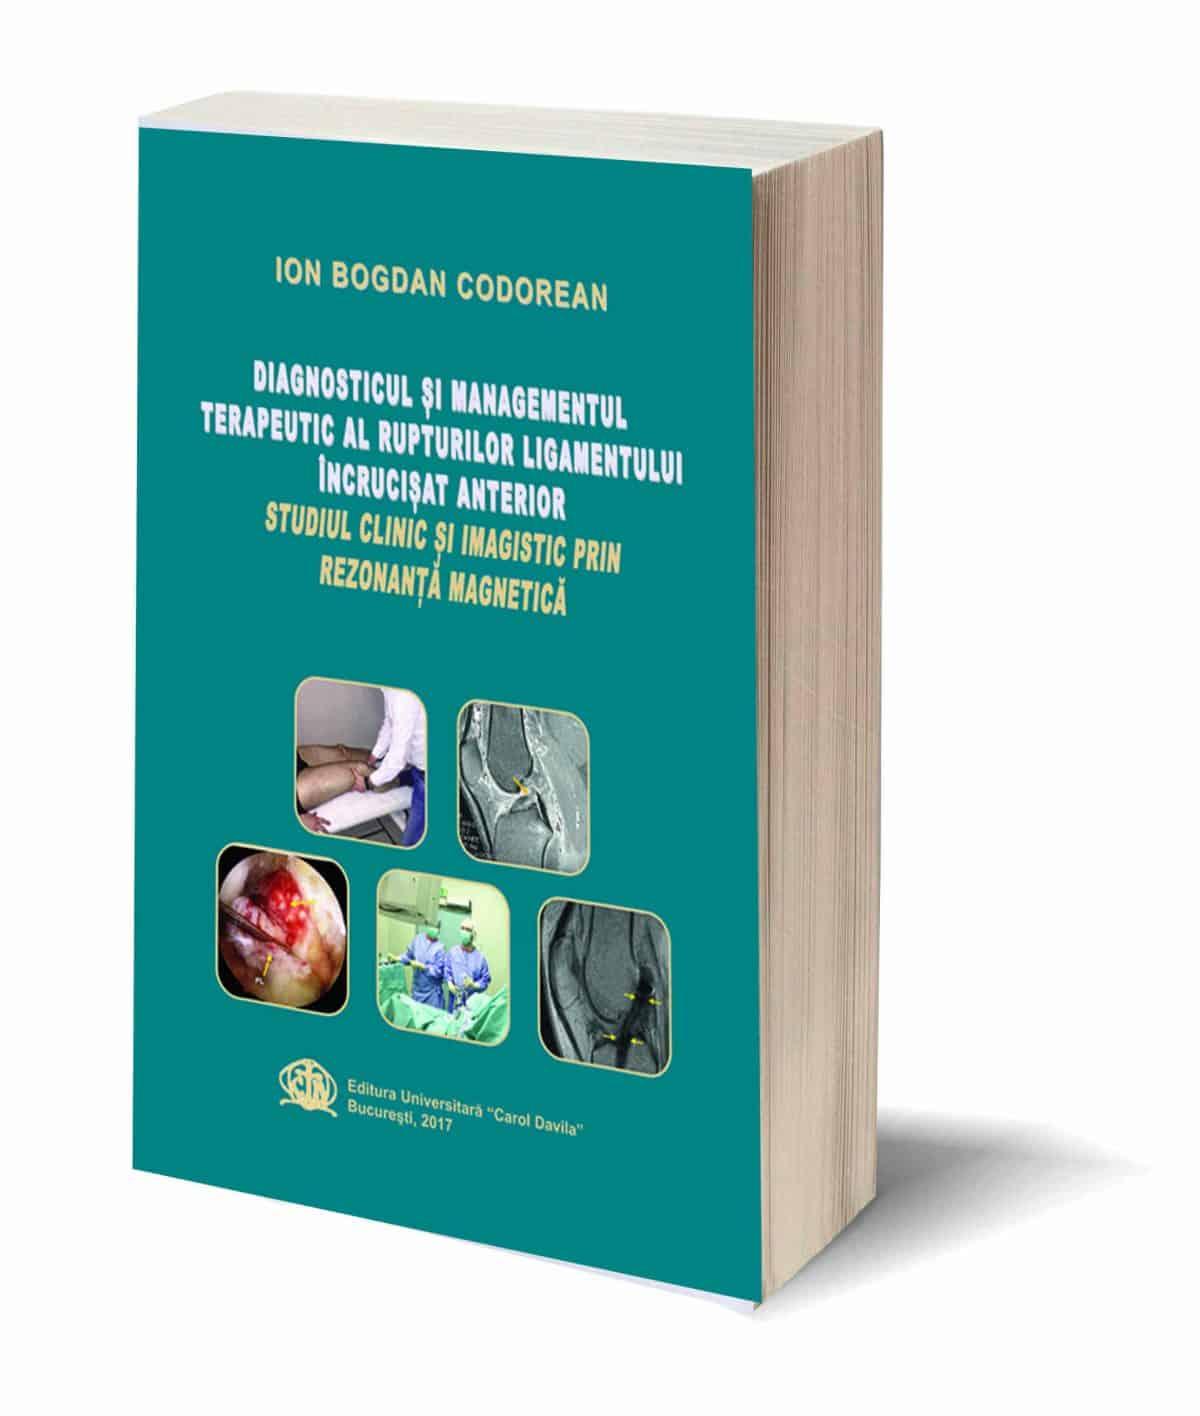 Diagnosticul-si-managementul-terapeutic-al-rupturilor-ligamentului-incrucisat-anterior-Studiu-clinic-si-imagistic-prin-rezonanta-magnetica-1200x1416.jpg